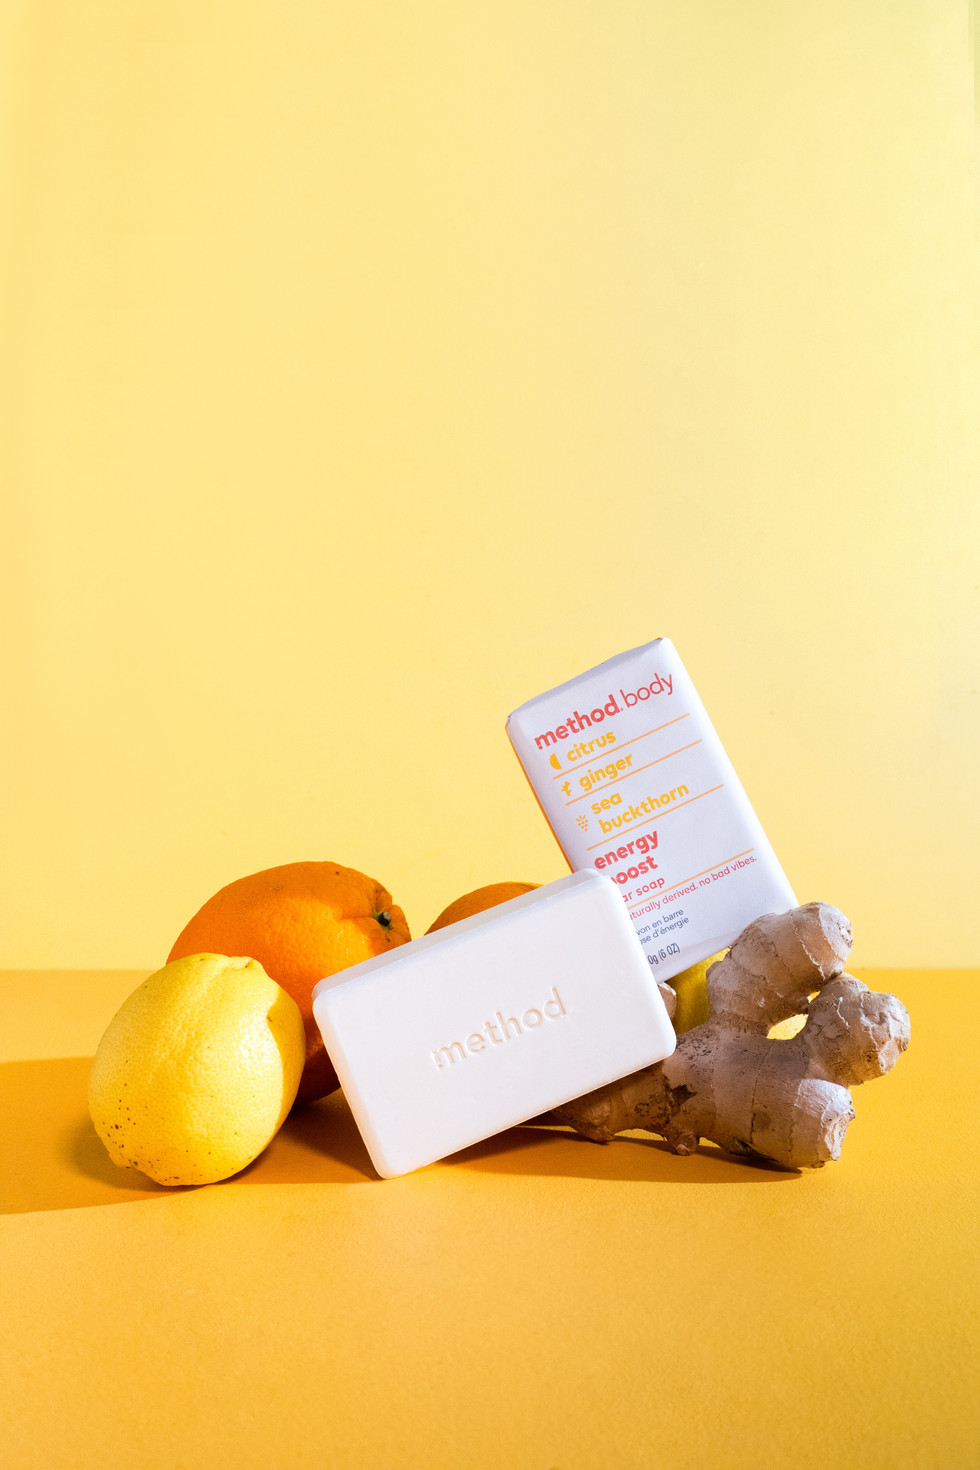 Soap With Citrus + Ginger | Method Body | Product Photography + Styling | Chromatone Studios